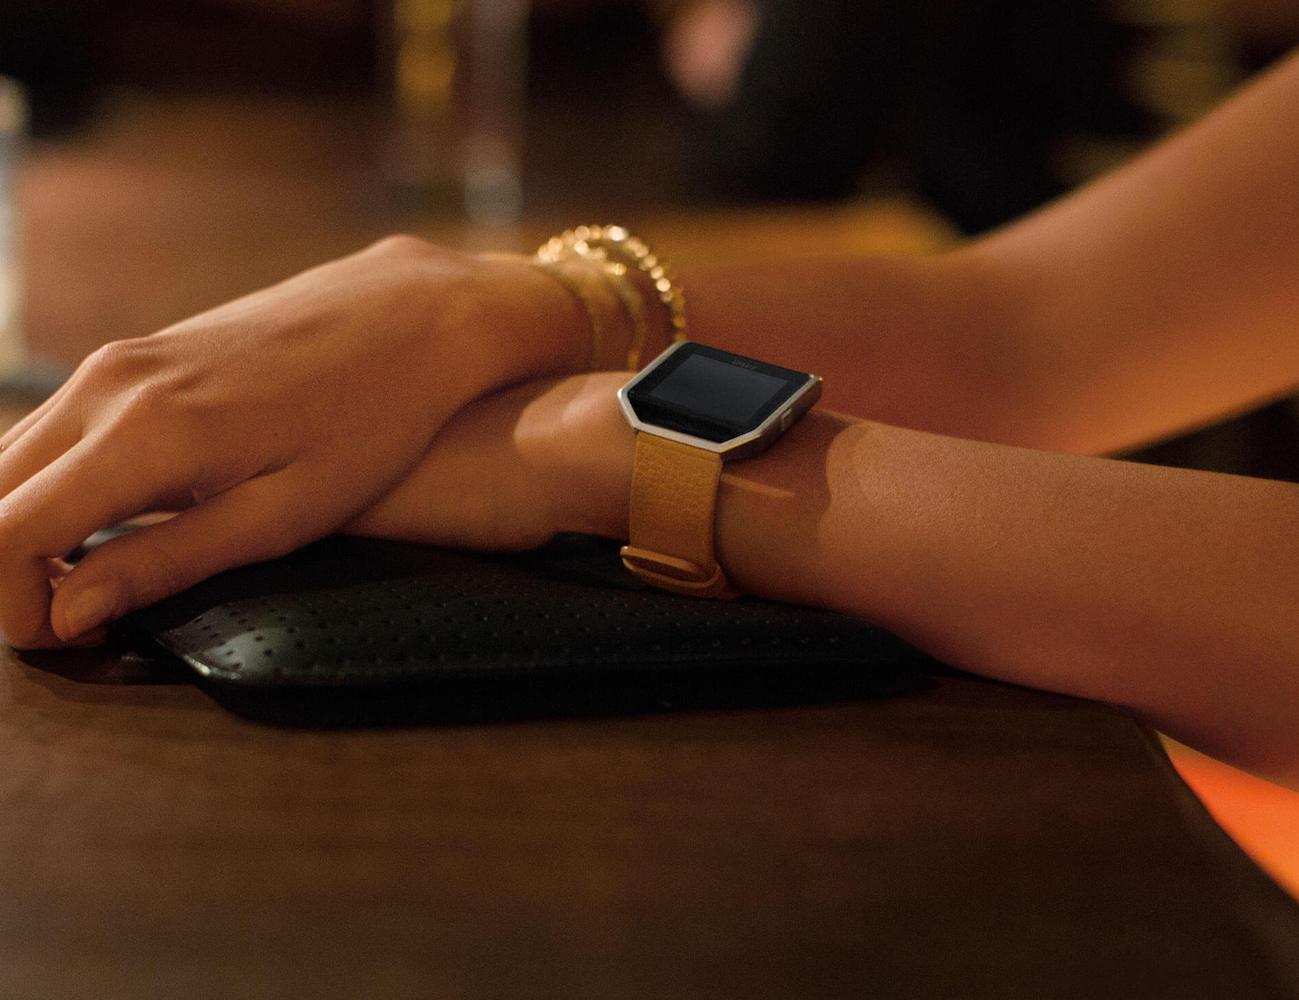 Fitbit+Blaze+%26%238211%3B+Modular+Fitness+Watch+Matching+Your+Style